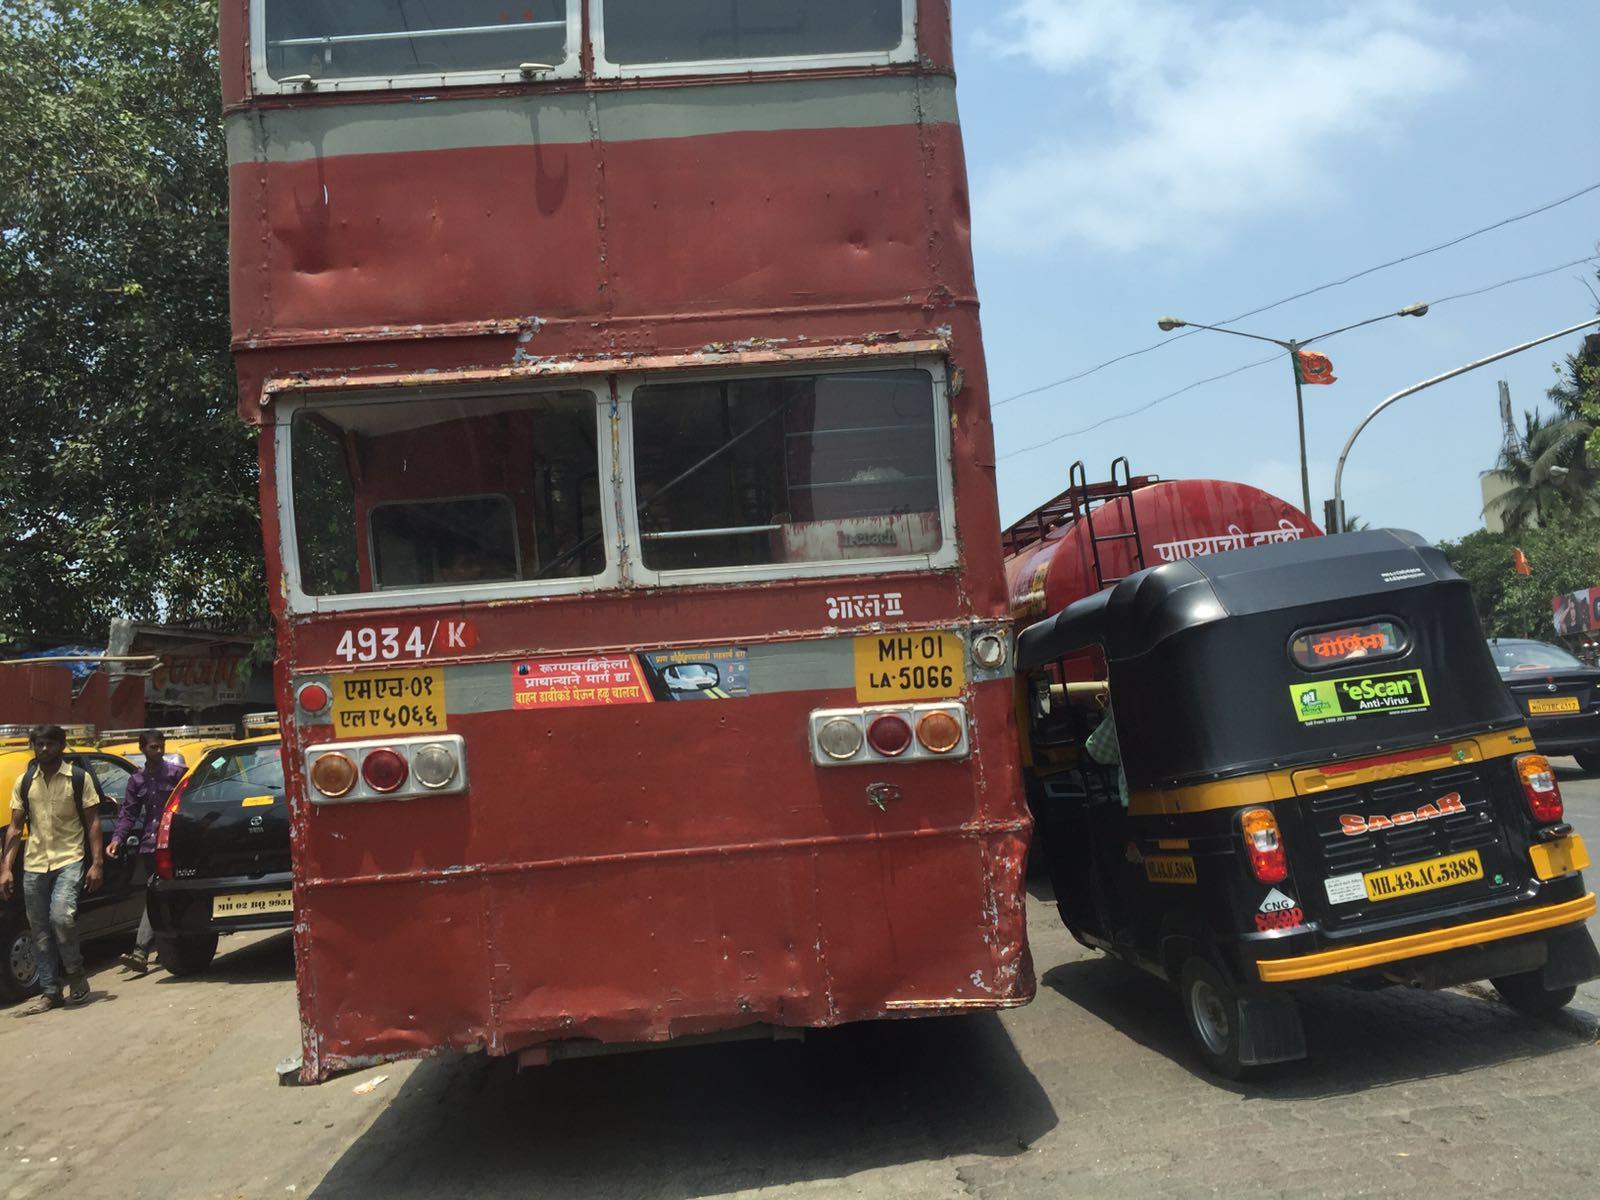 Crazy Mumbai traffic